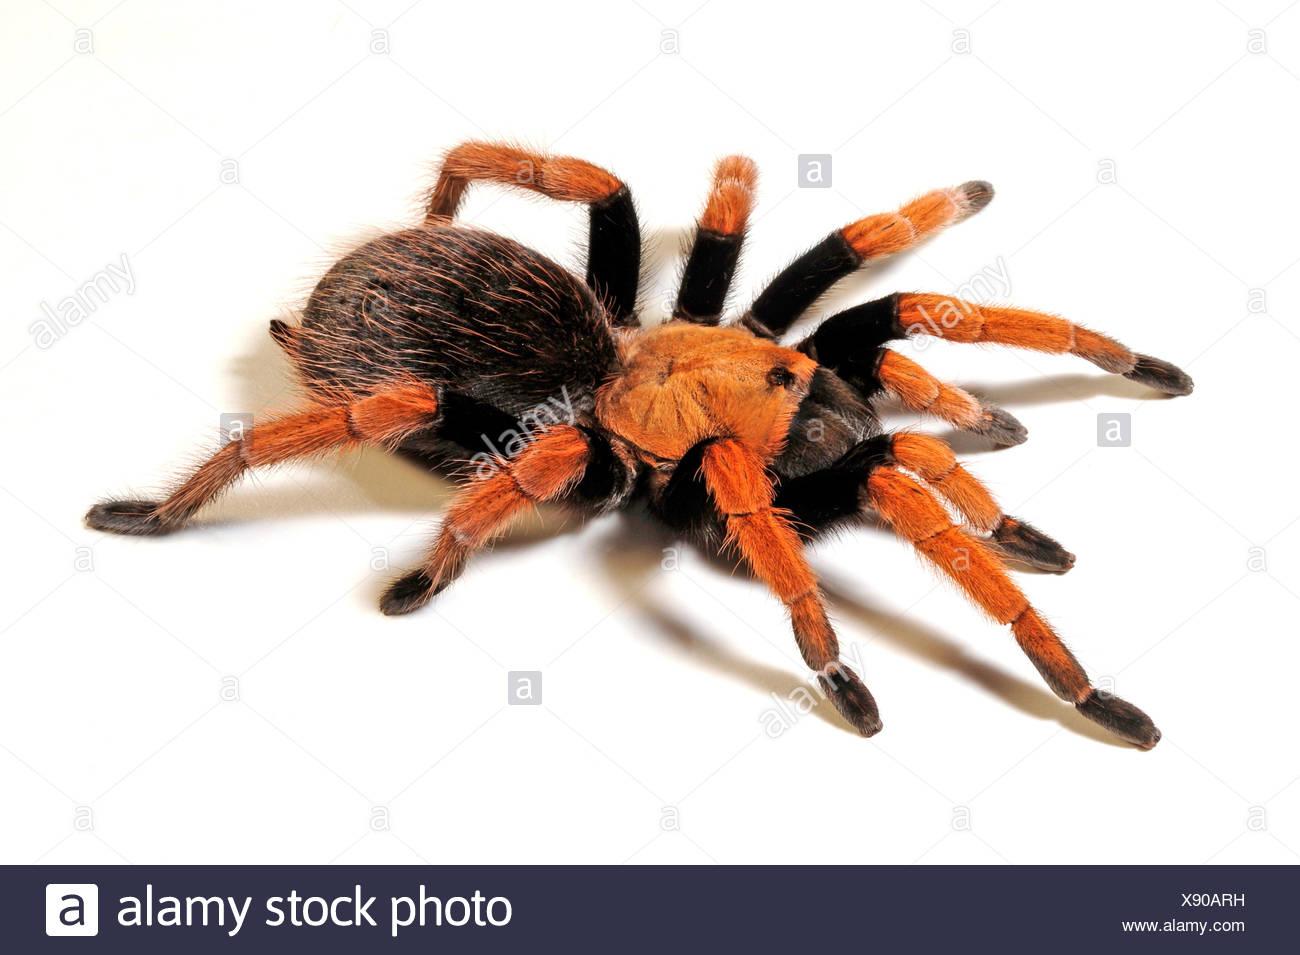 Mexican Blood Leg, Mexican Bloodleg Tarantula (Aphonopelma bicoloratum  ), bicoloured bird, Mexico - Stock Image